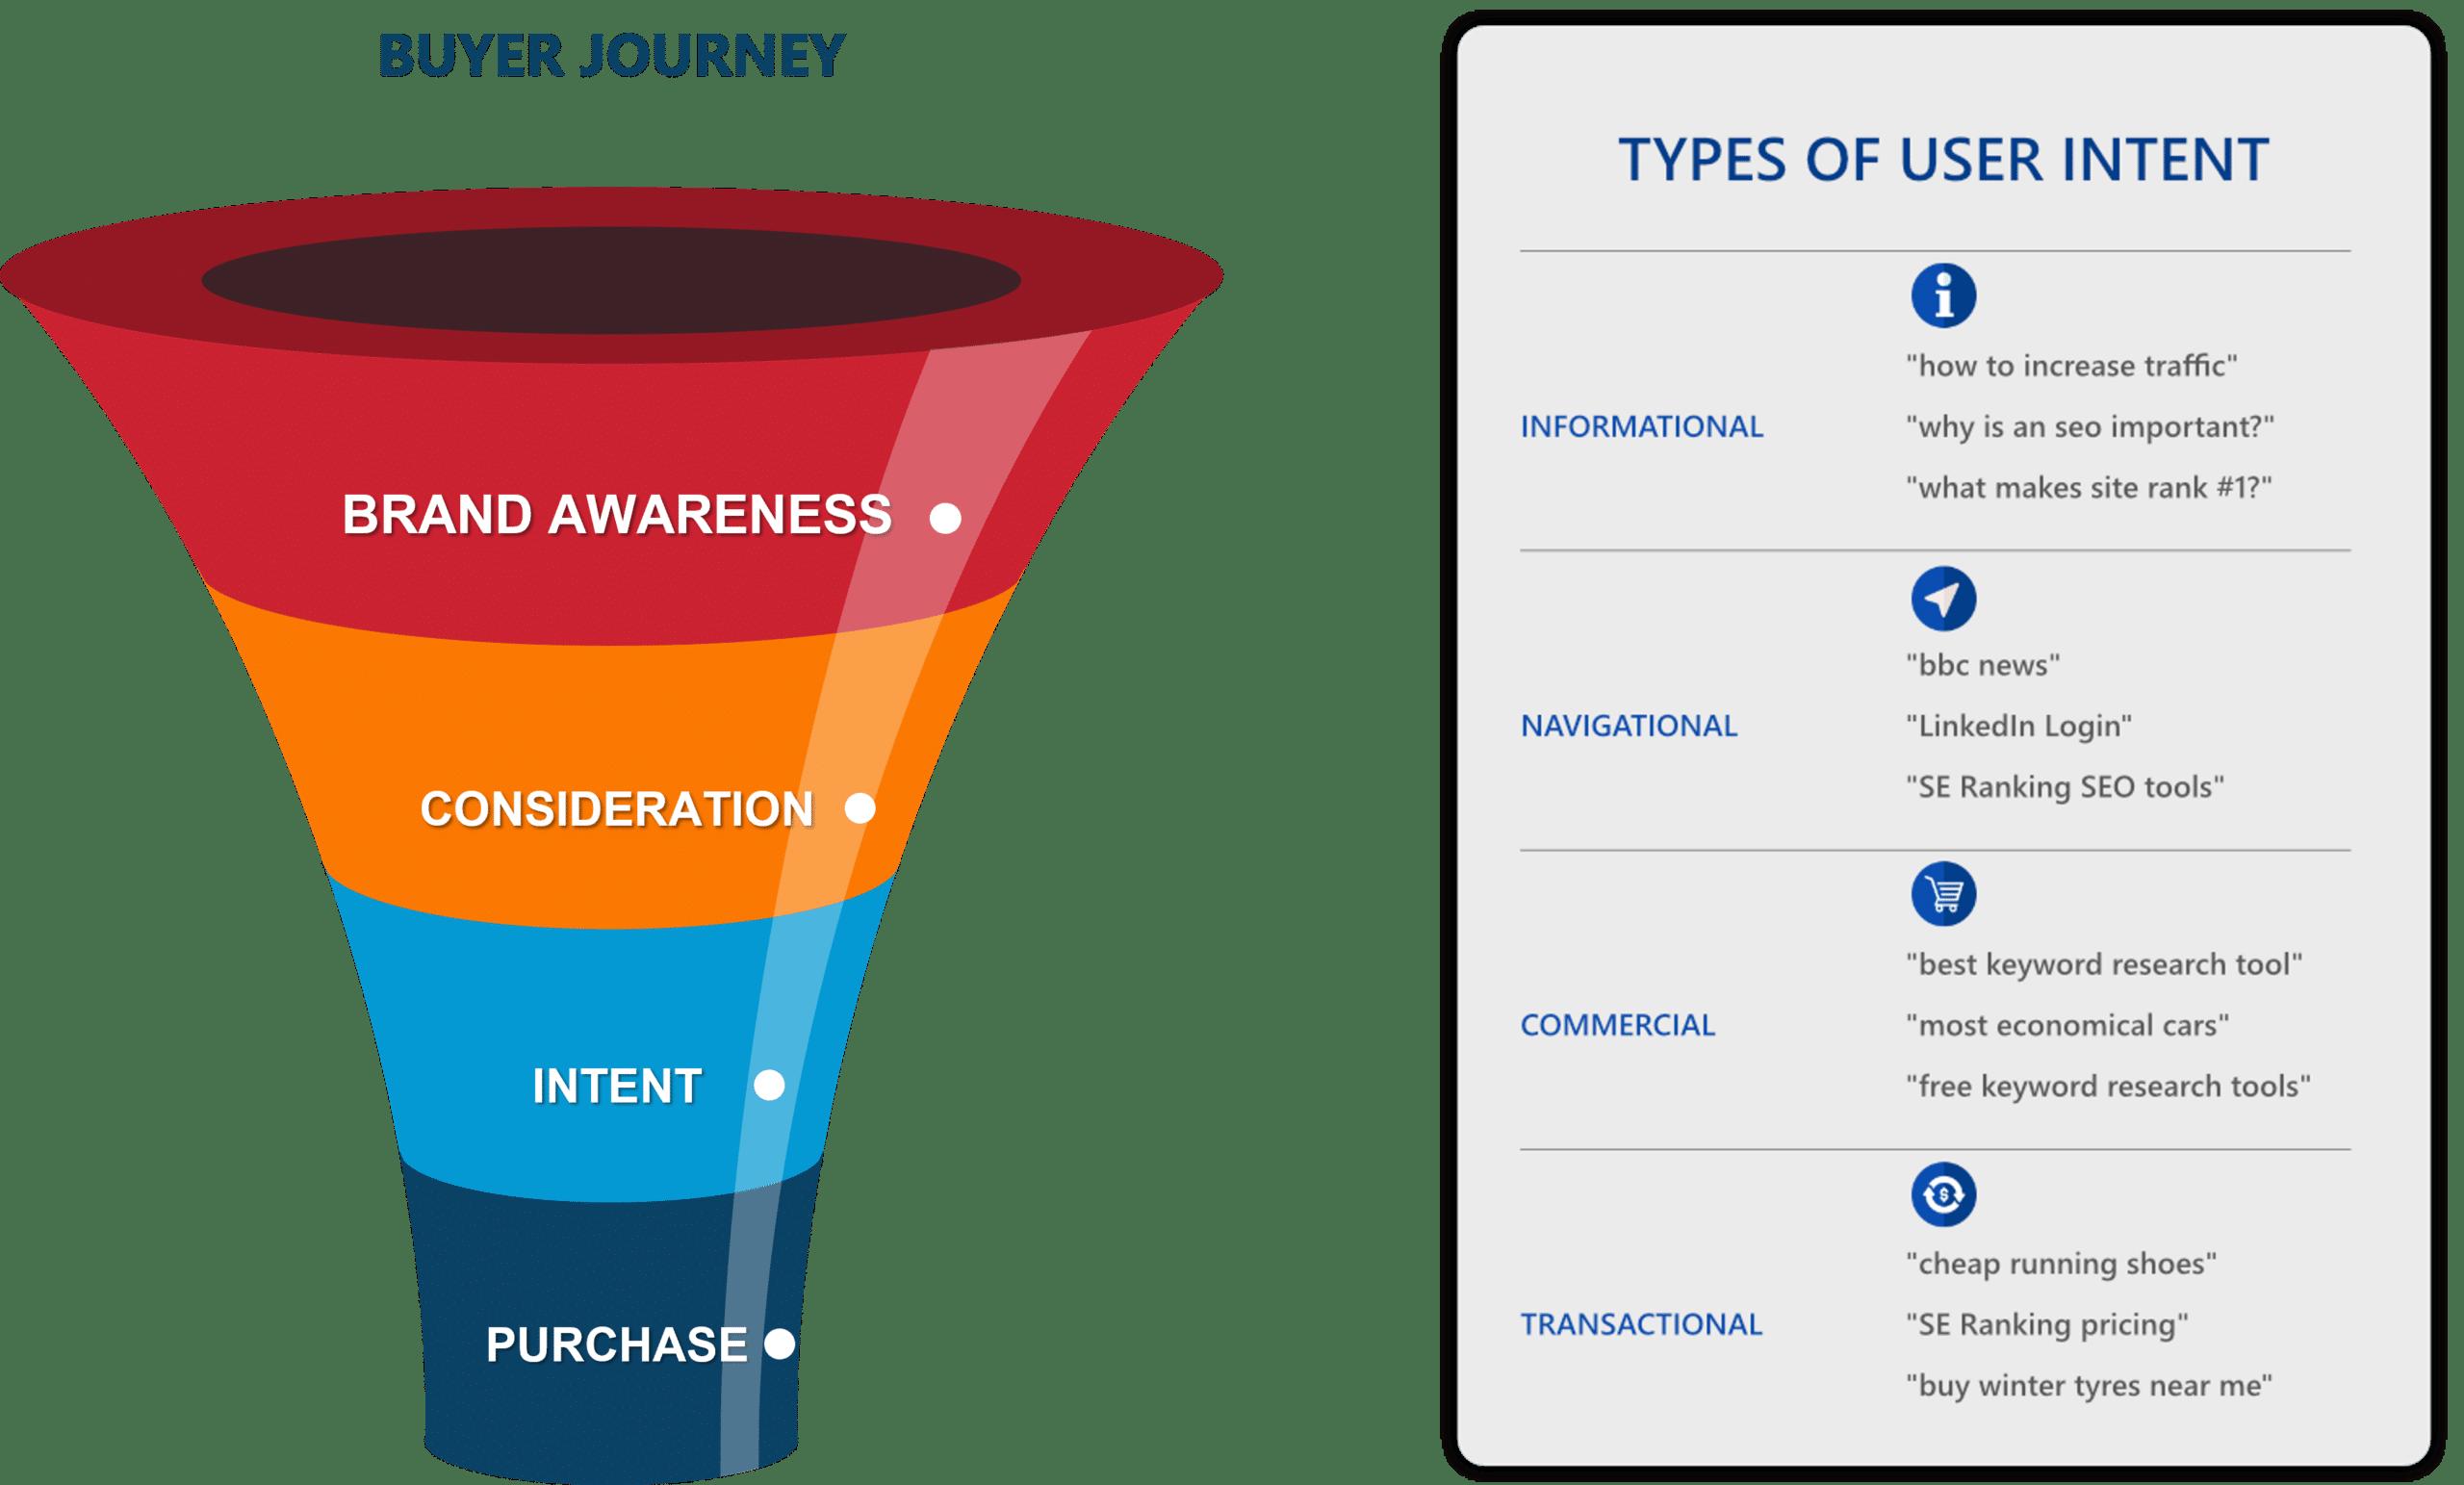 havig keywords across all stages of buyer journey